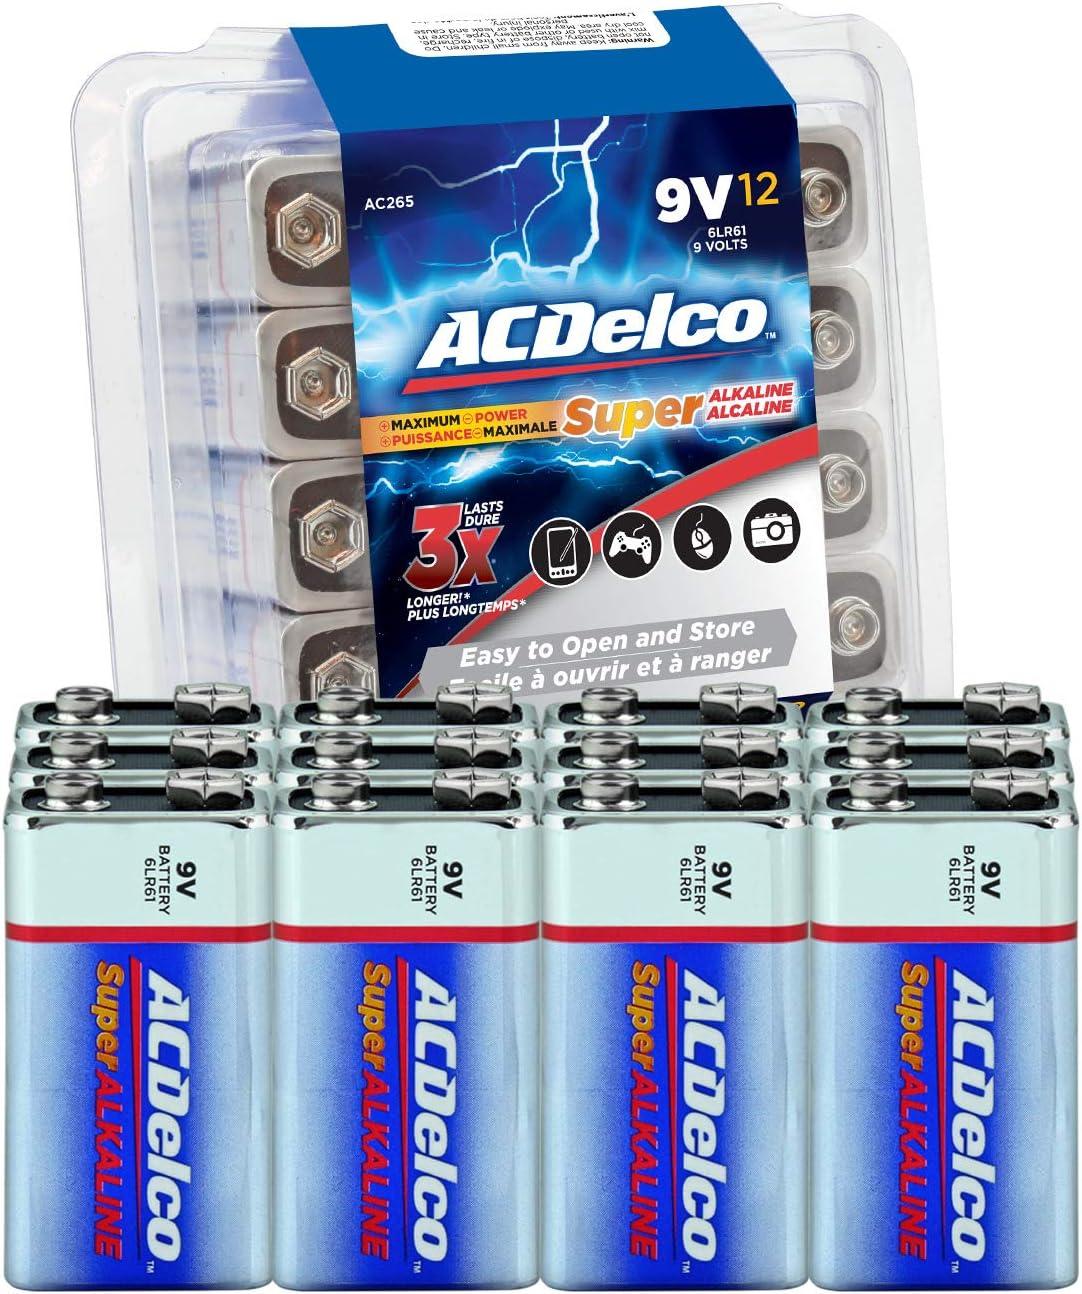 Amazon Com Acdelco 12 Count 9 Volt Batteries Maximum Power Super Alkaline Battery 7 Year Shelf Life Recloseable Packaging Electronics